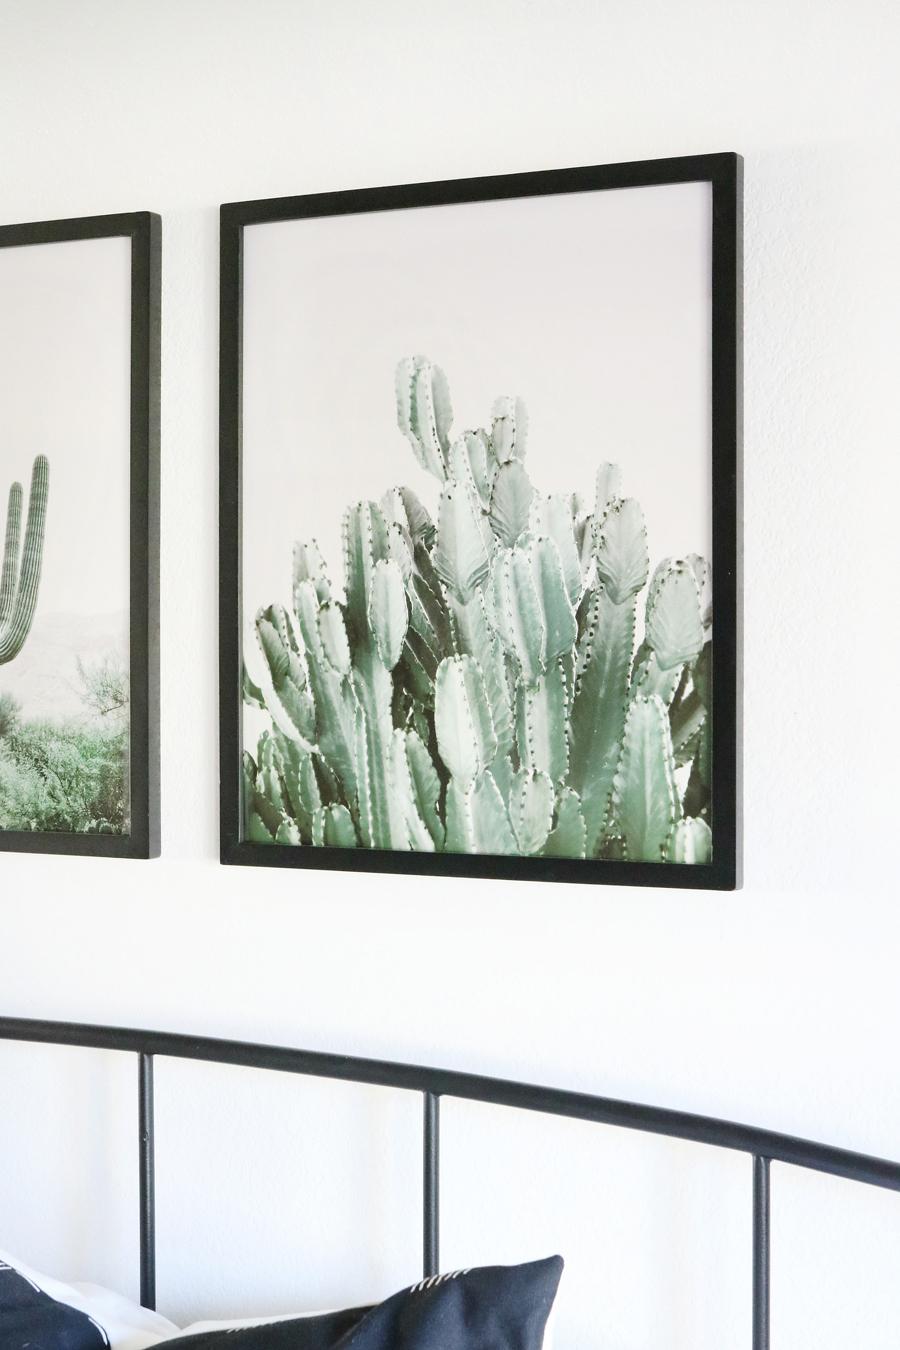 Boho Inspired Artwork with Better Homes & Gardens Black Gallery Wall Frames